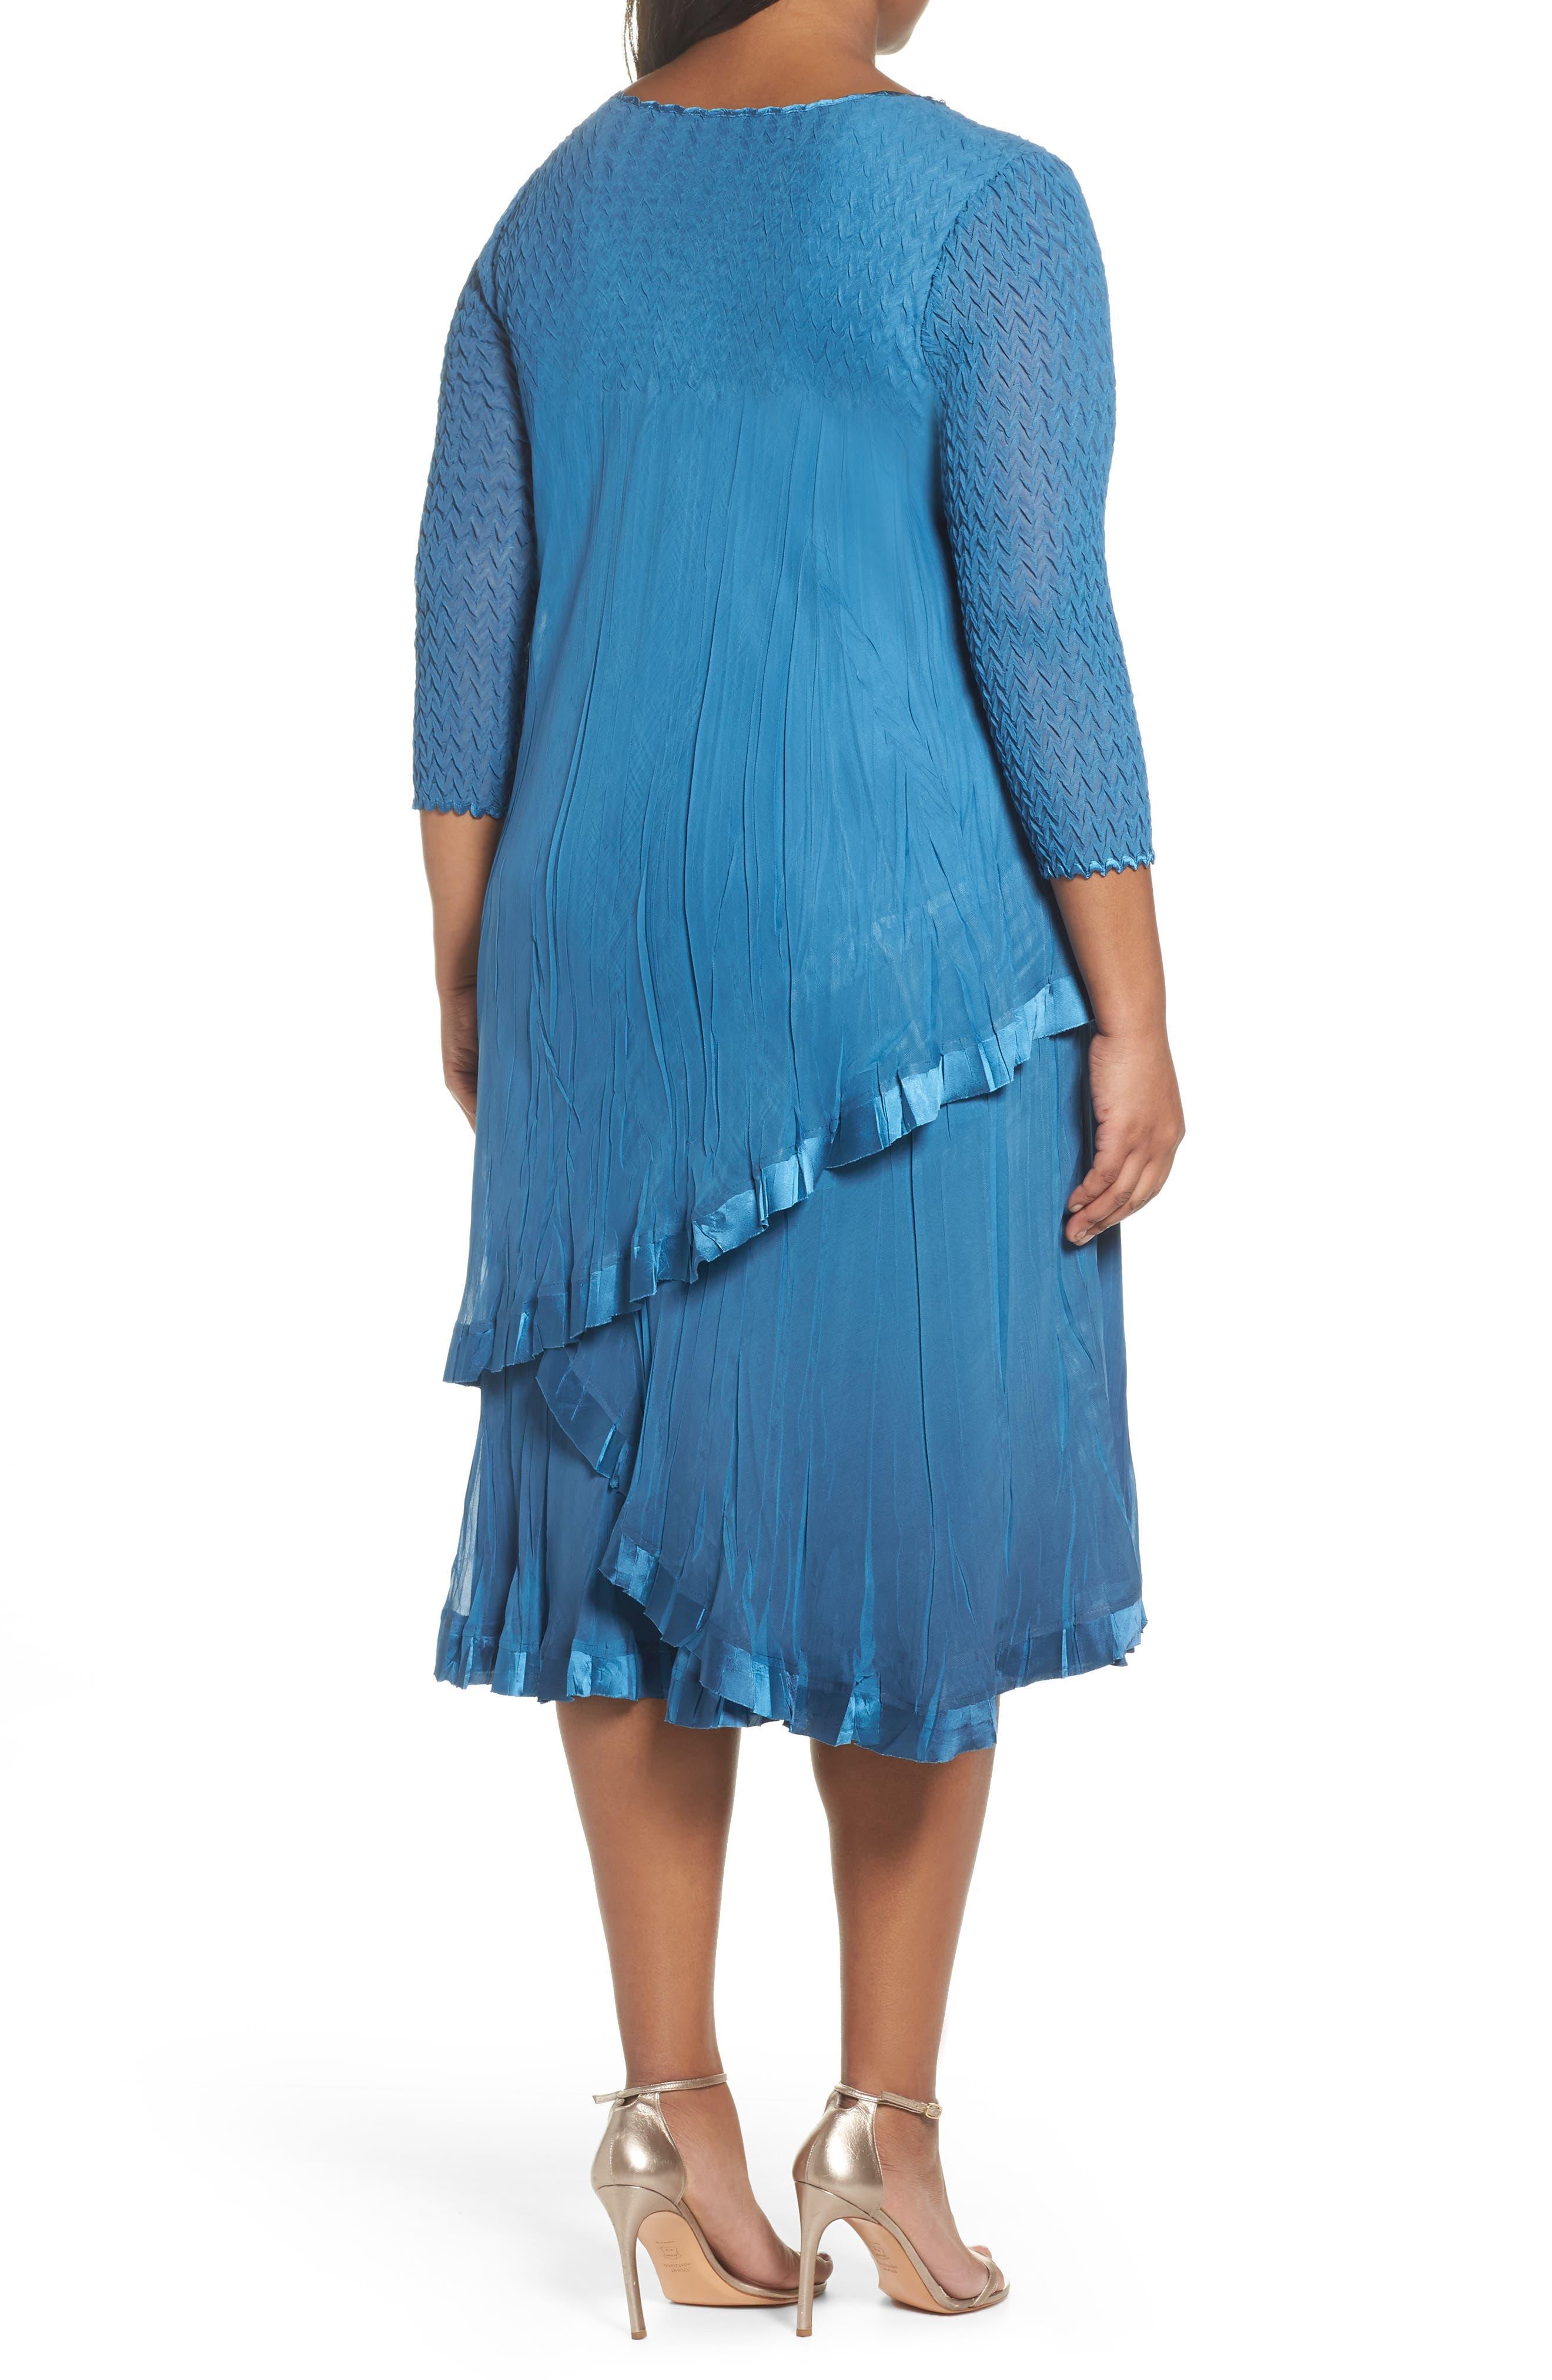 Dress Tiered Chiffon & Charmeuse Dress,                             Alternate thumbnail 2, color,                             Blue Dusk Night Ombre